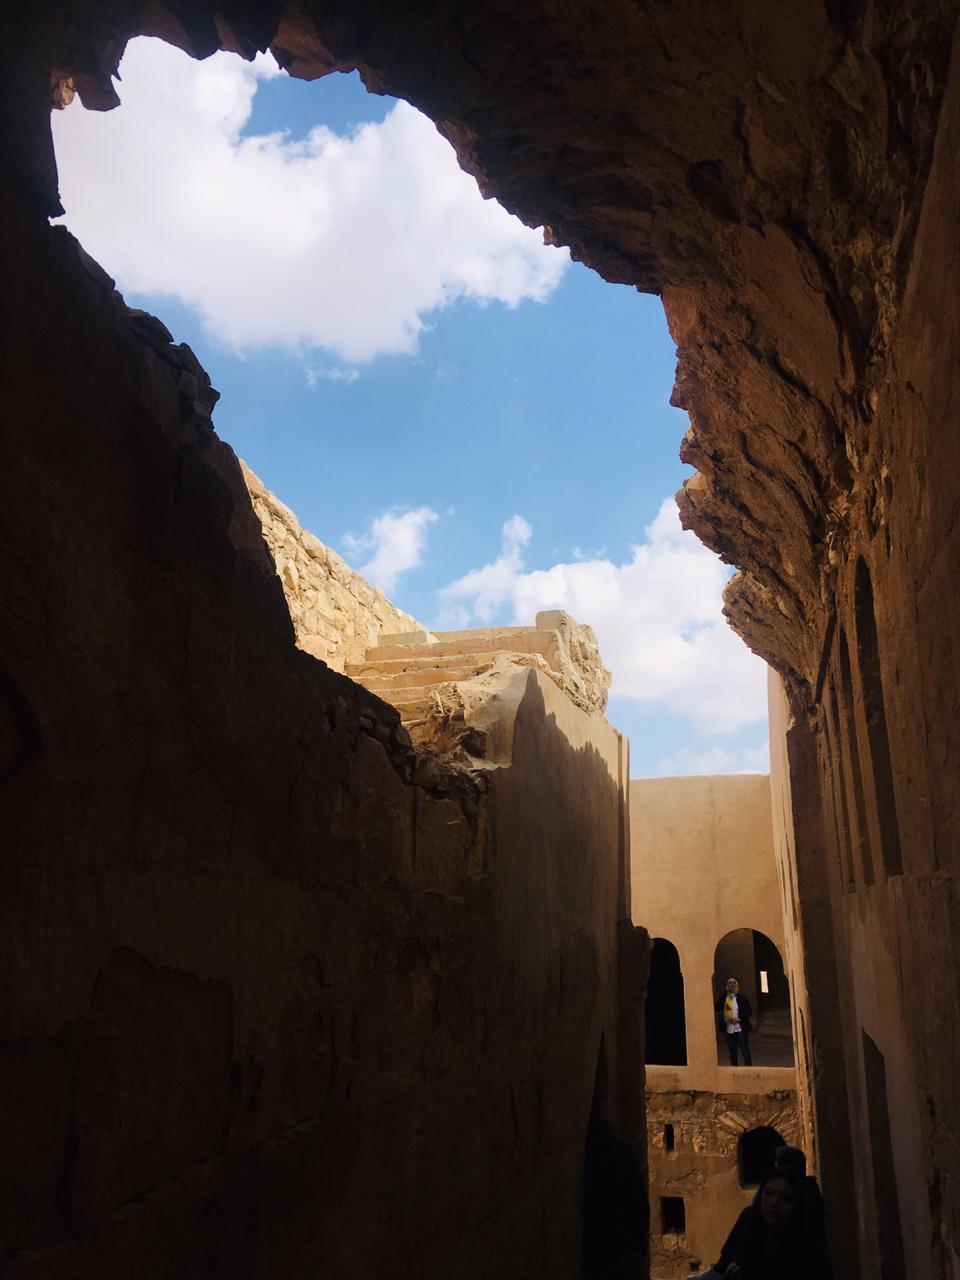 Desert Castles – Qasr Al-Kharranah: a mysterious castle